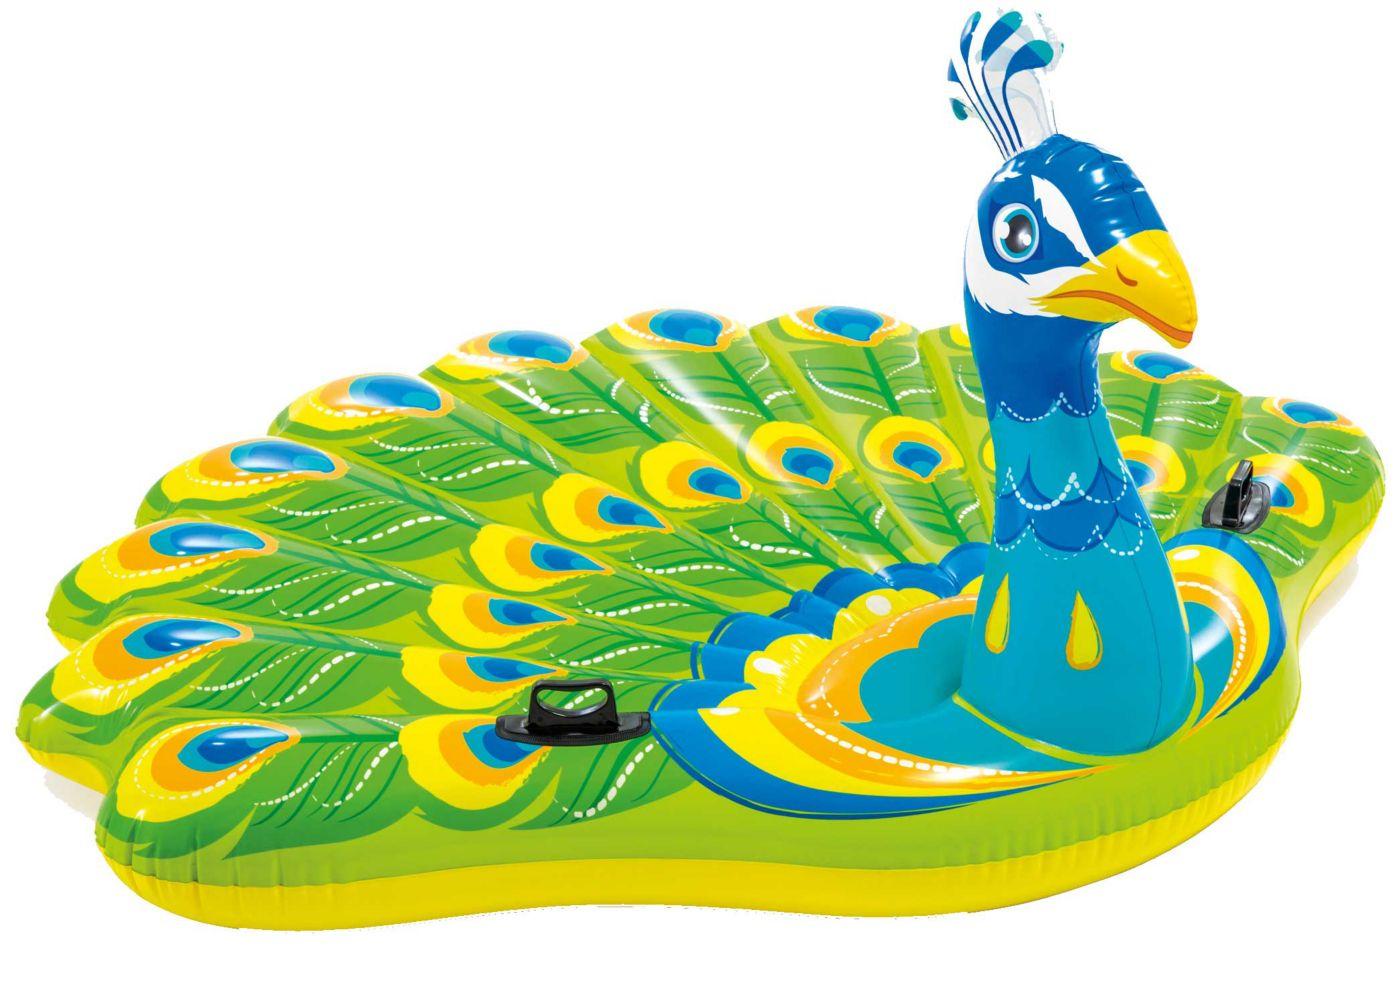 Intex Peacock Island Inflatable Pool Float